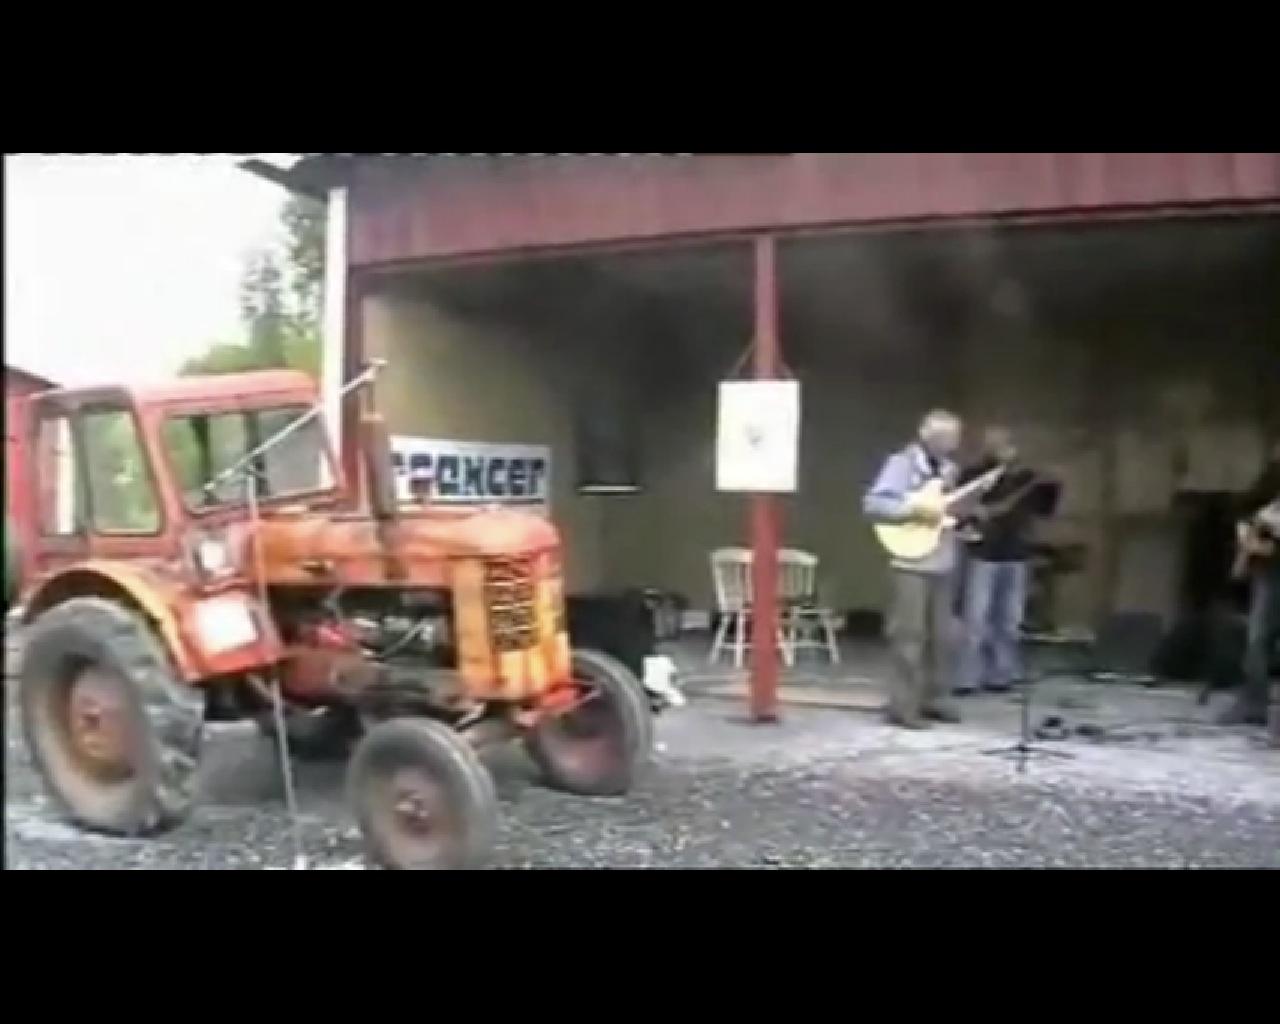 traktorjazz